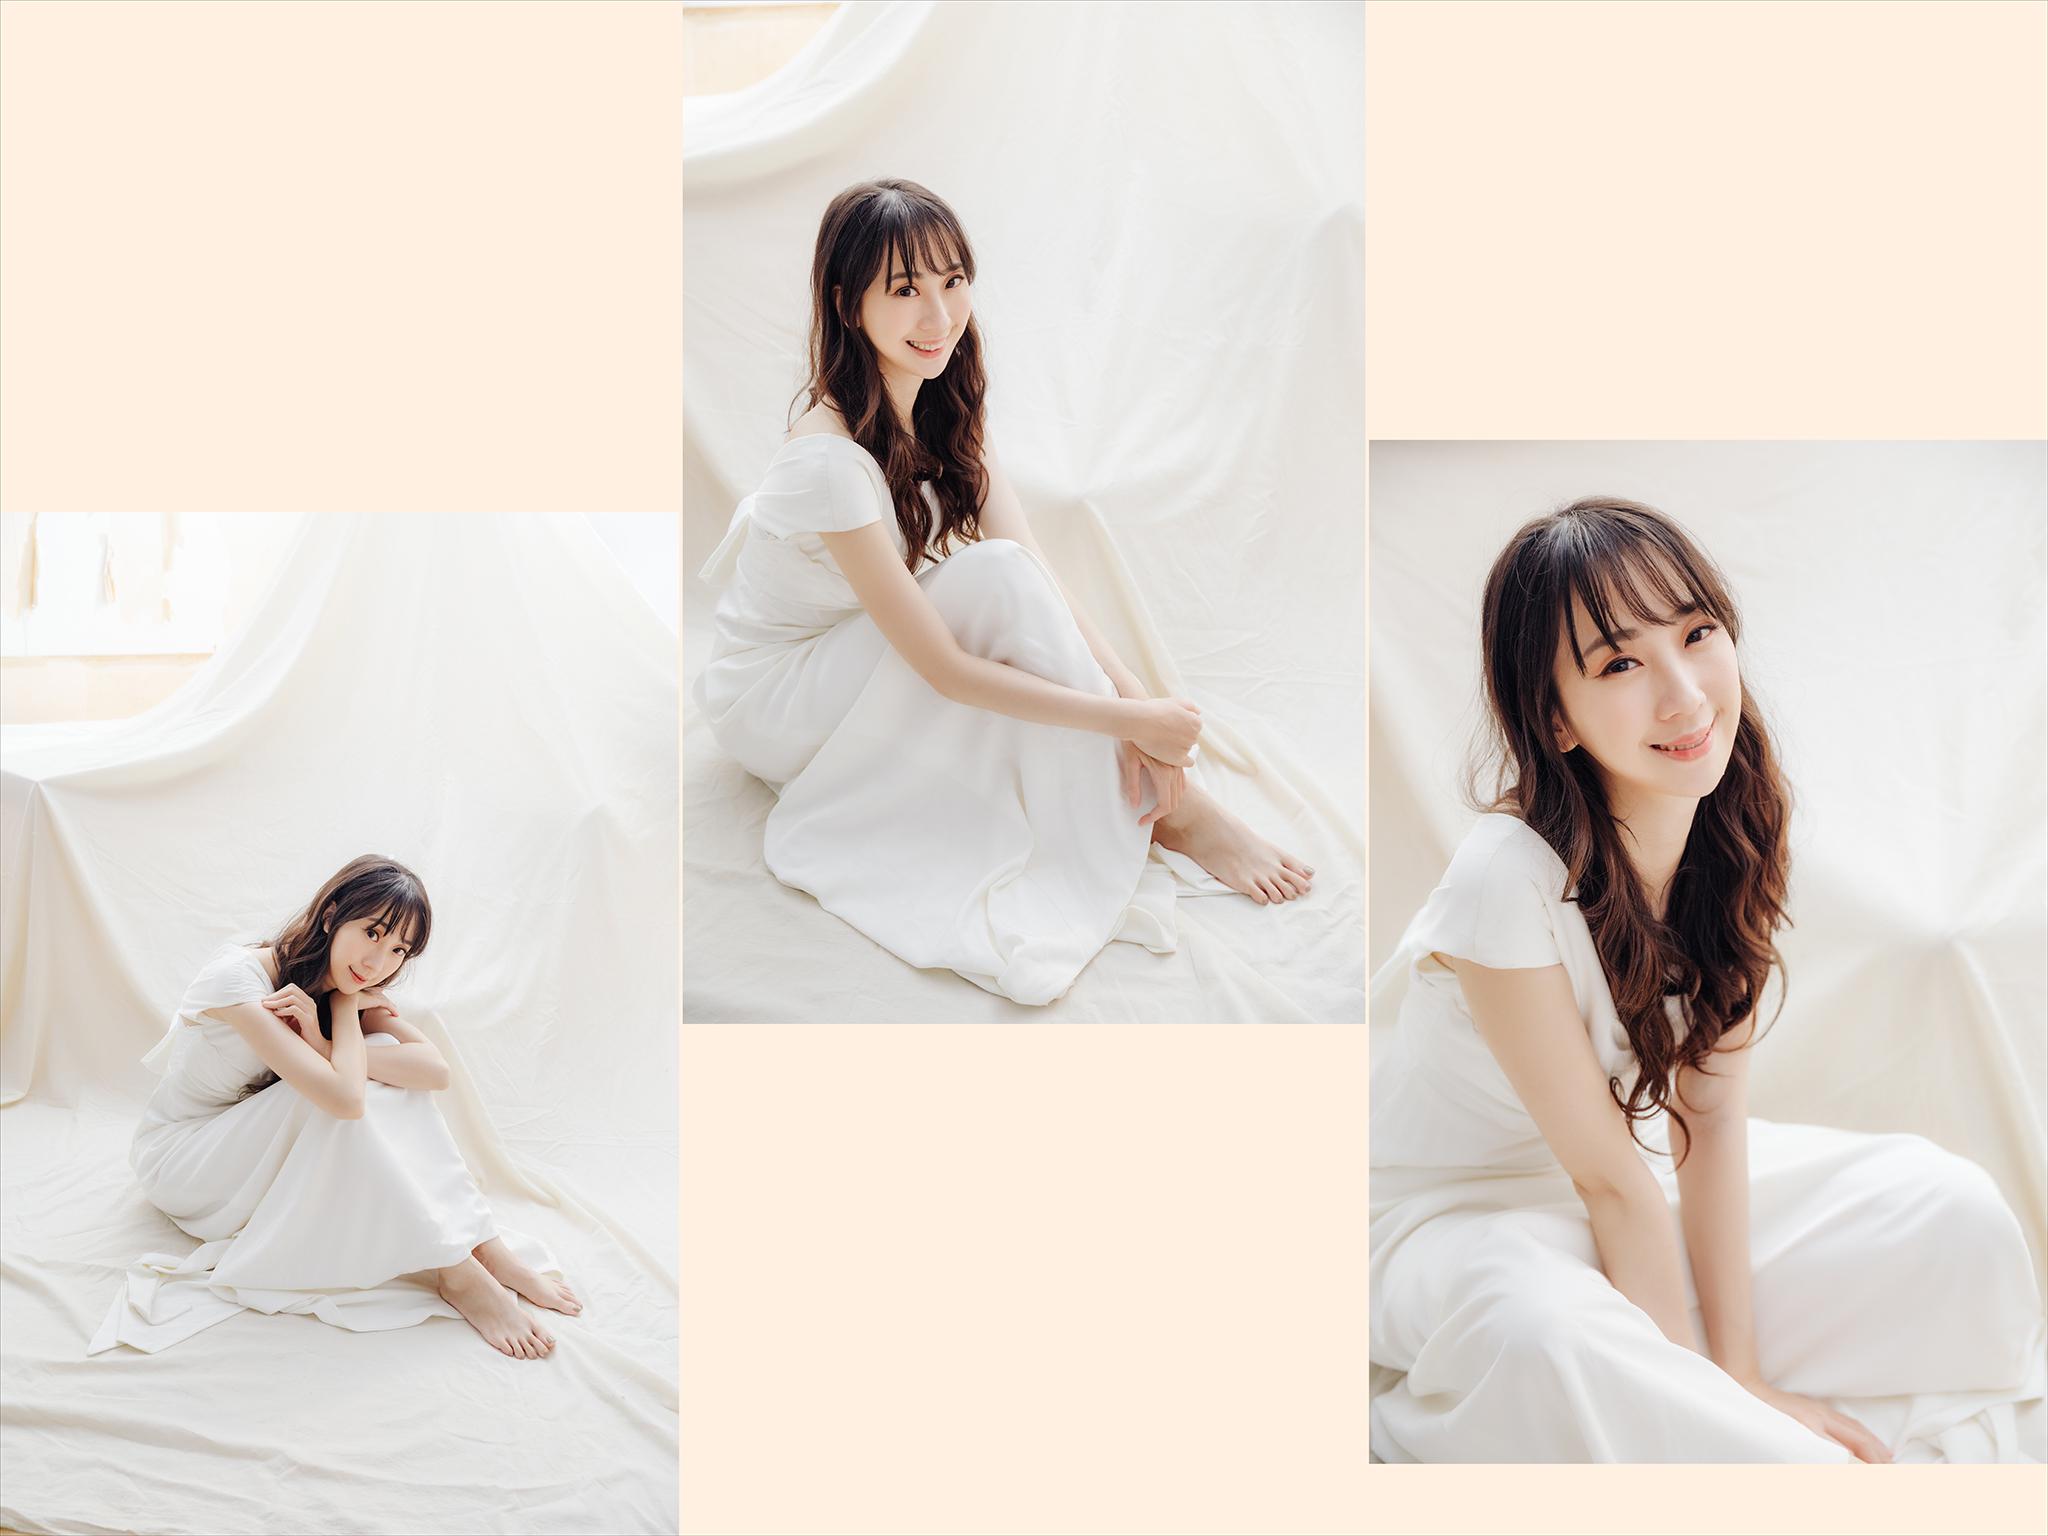 50659285458 2d020ec819 o - 【自主婚紗】+Melody+